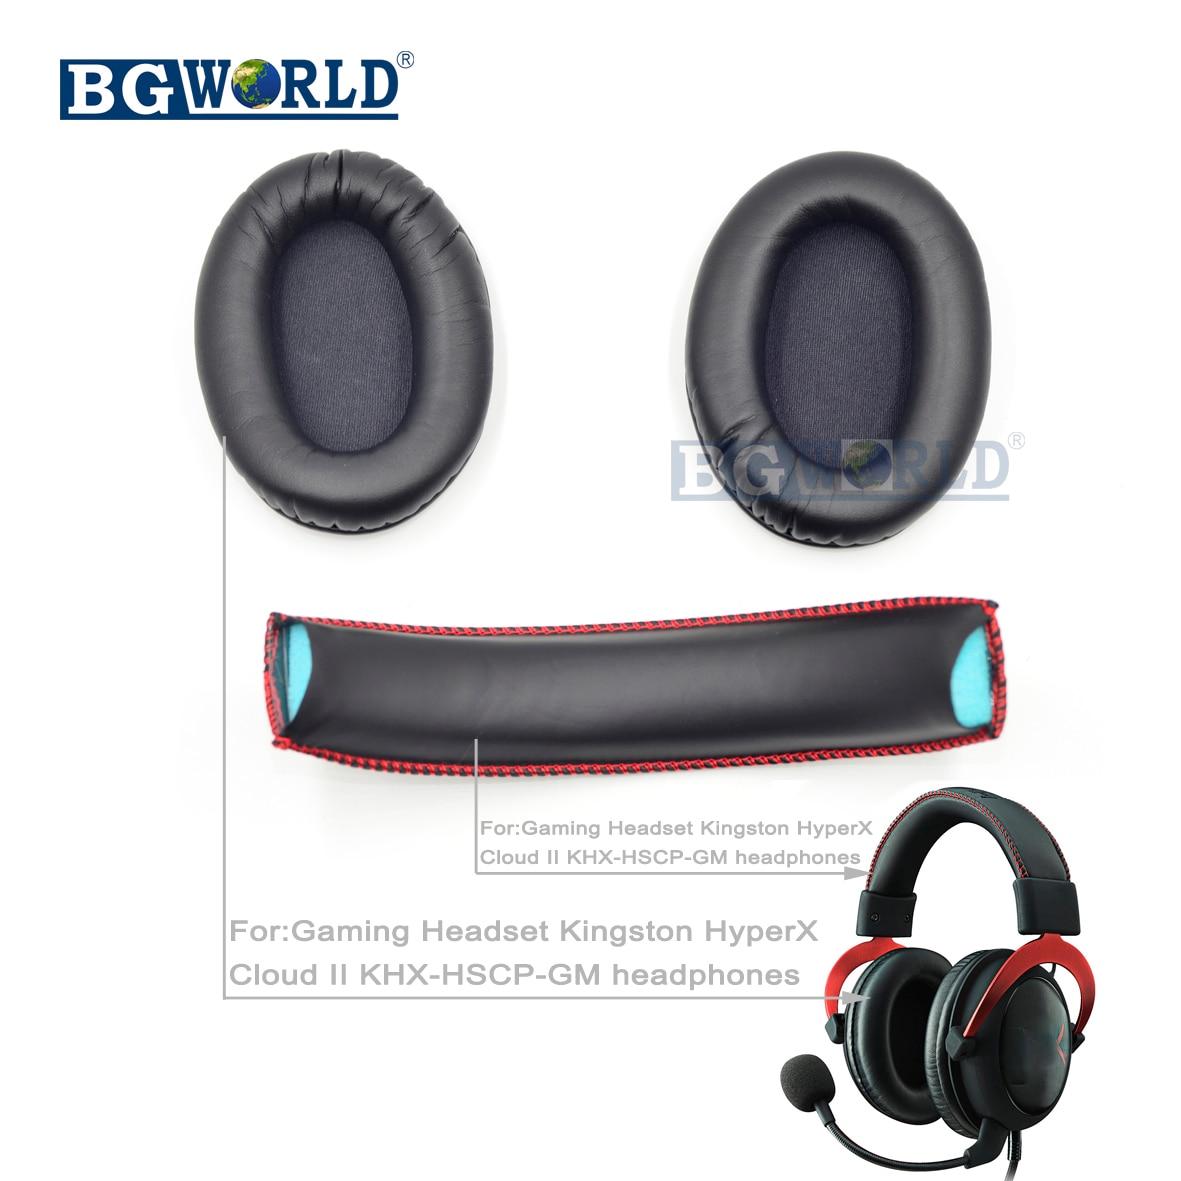 BGWORLD Replacement Earpads Ear Foam Headband Head Bands Pad Cushion For Kingston HyperX Cloud II KHX-HSCP-GM Headphones Sponge